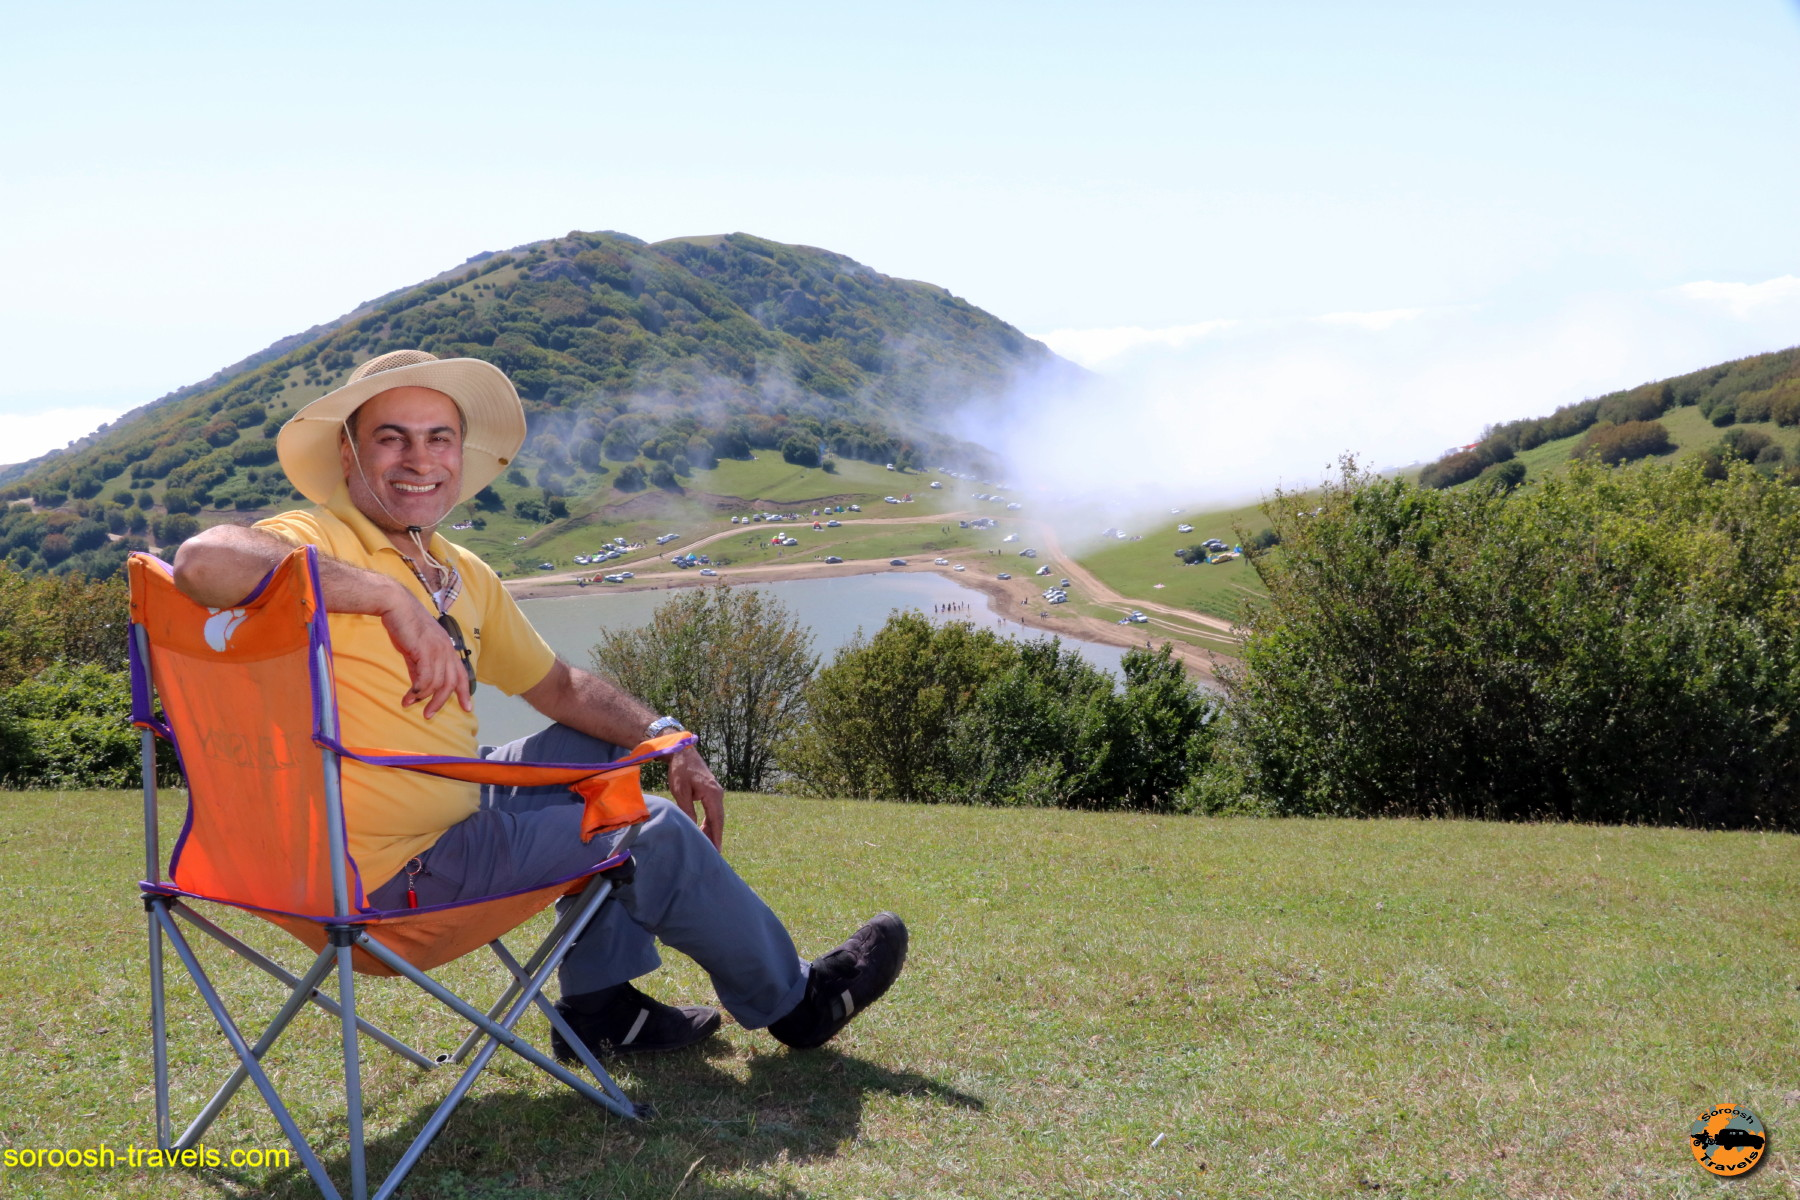 سفر به دریاچه سوها – تابستان ۱۳۹۶